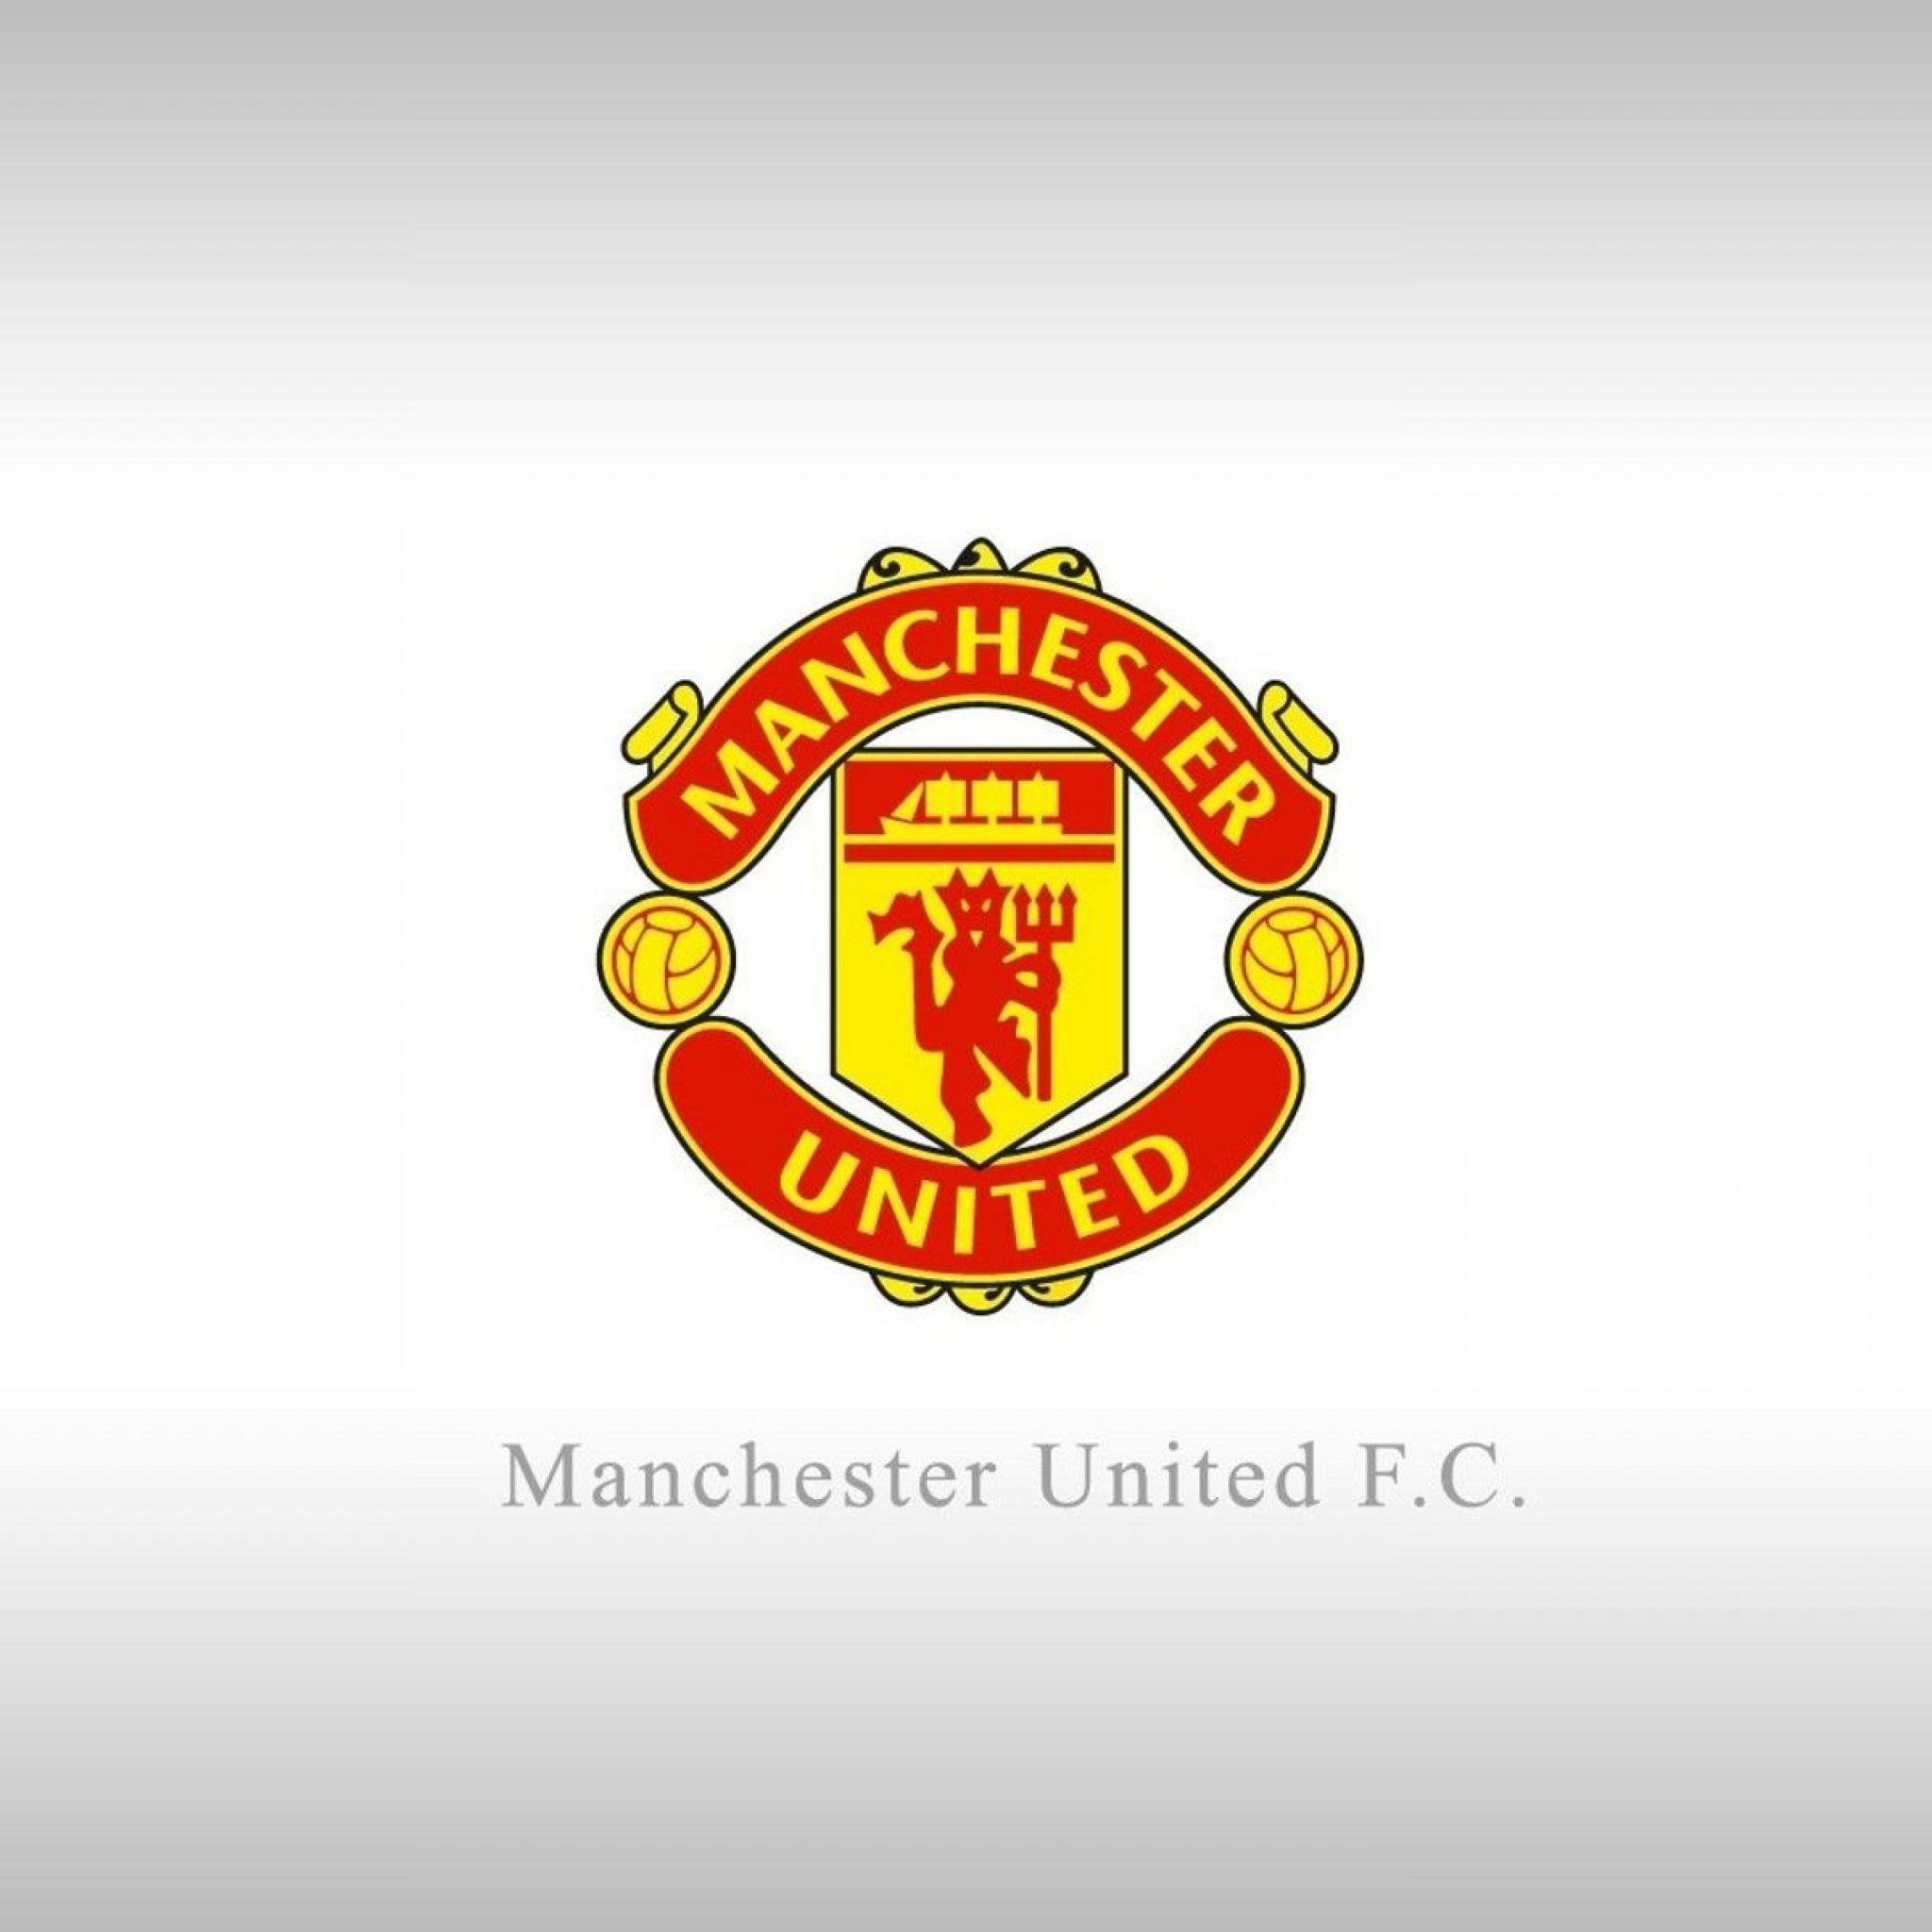 Wallpapers Logo Manchester United Terbaru 2016 - Wallpaper ...